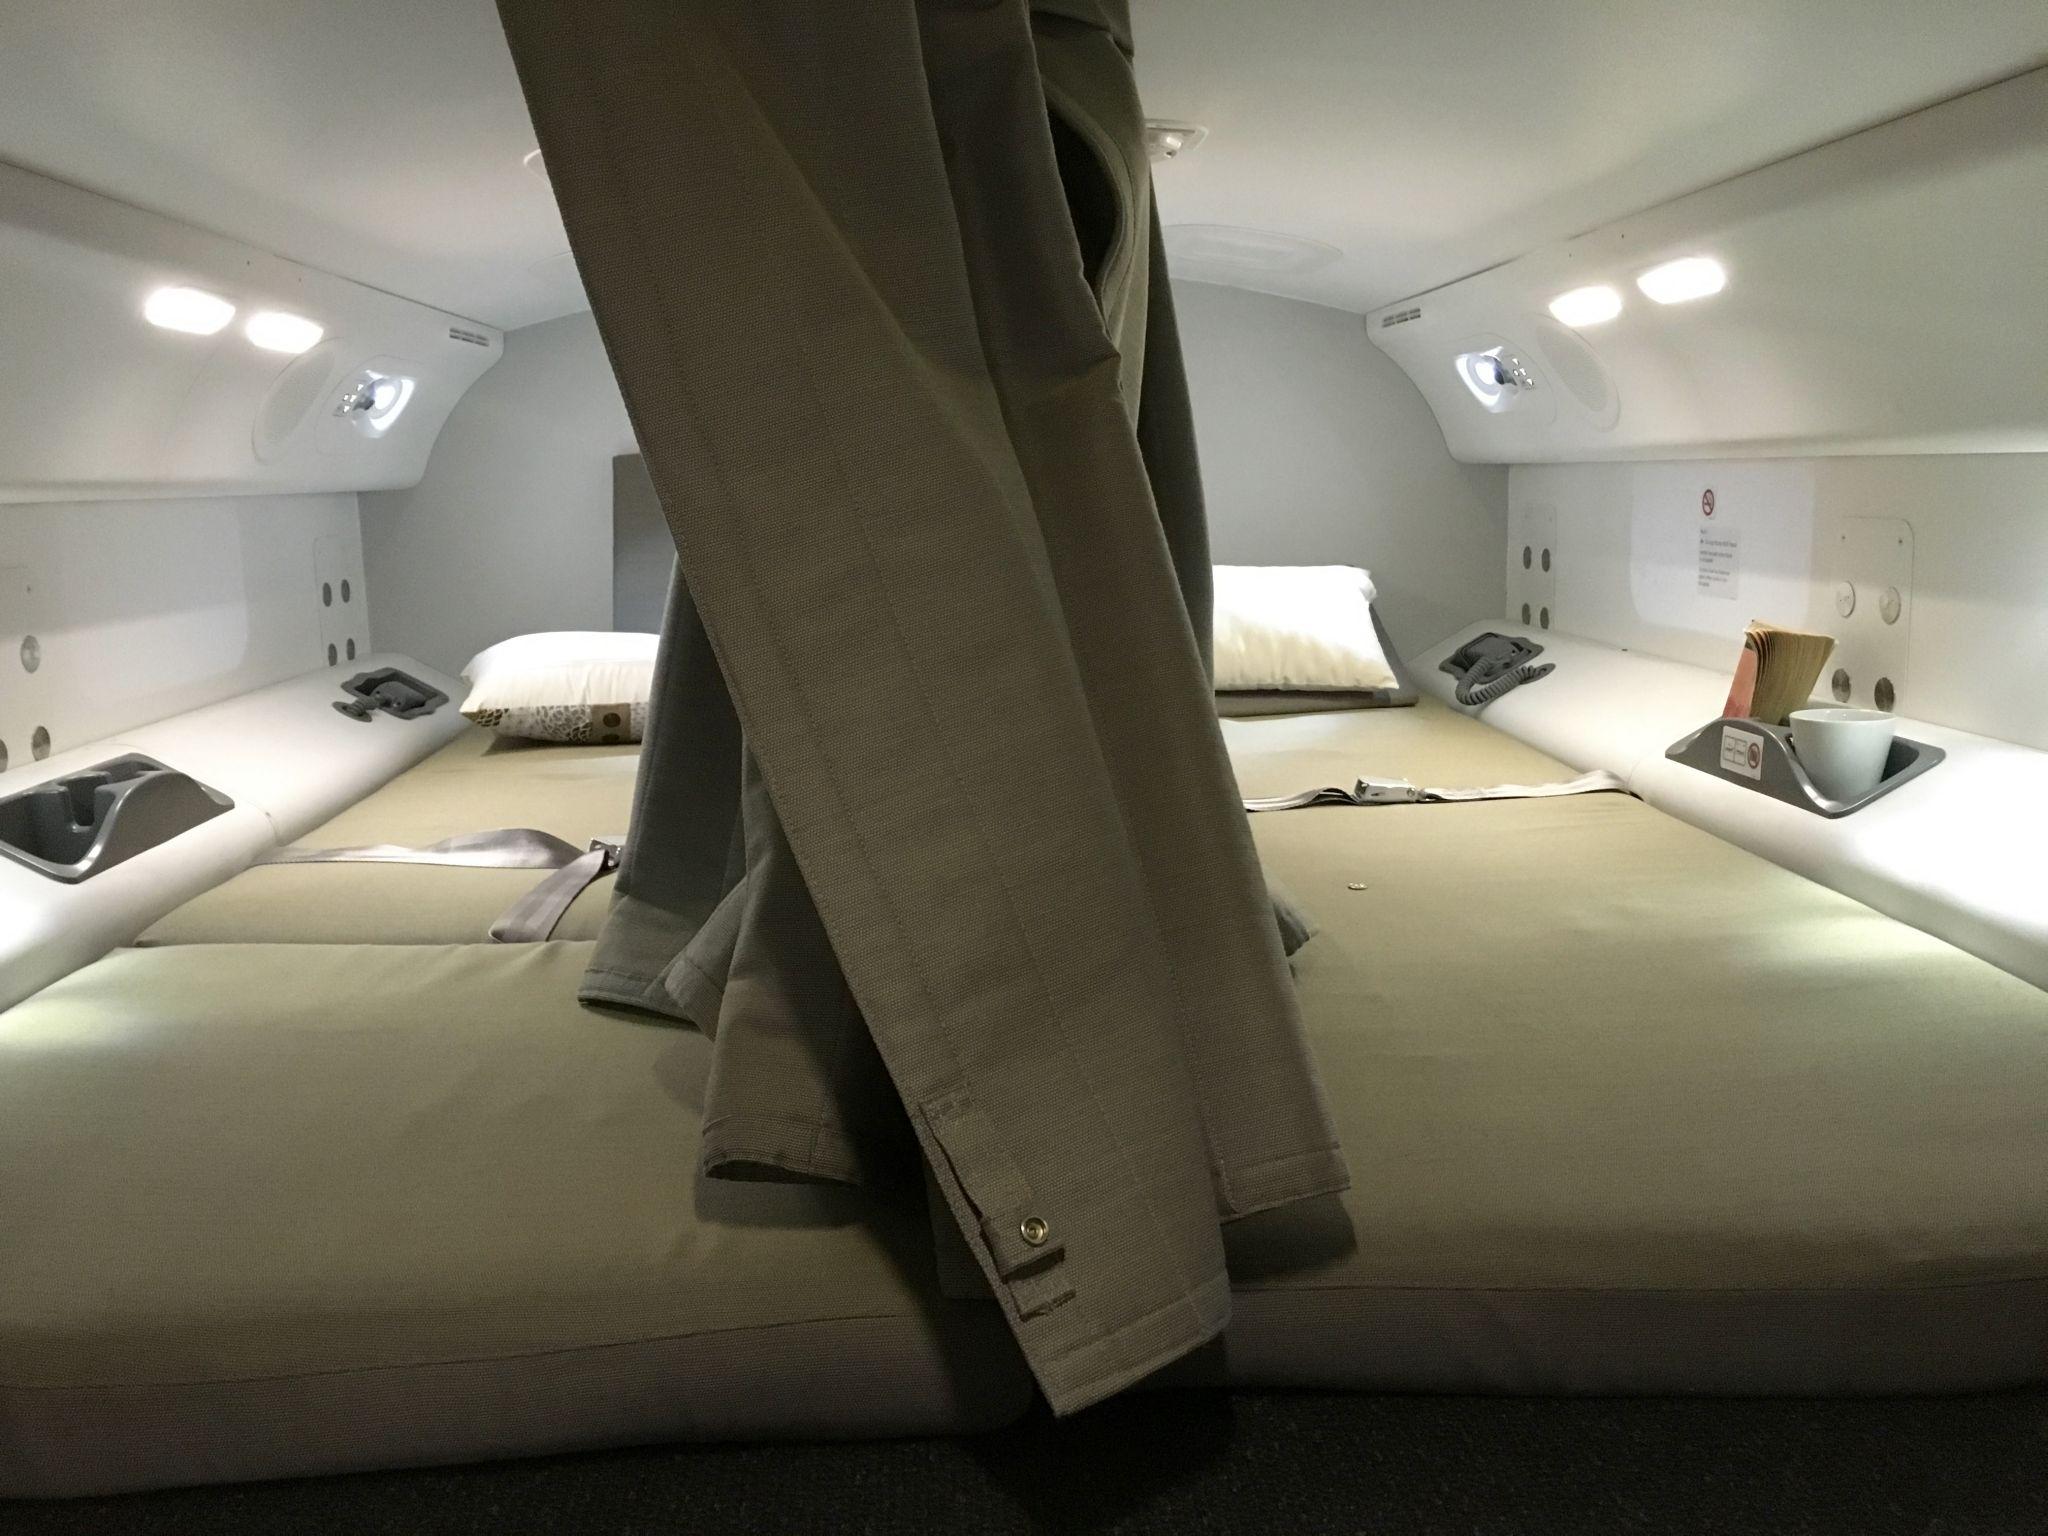 Where Pilots And Flight Attendants Sleep On Long Flights